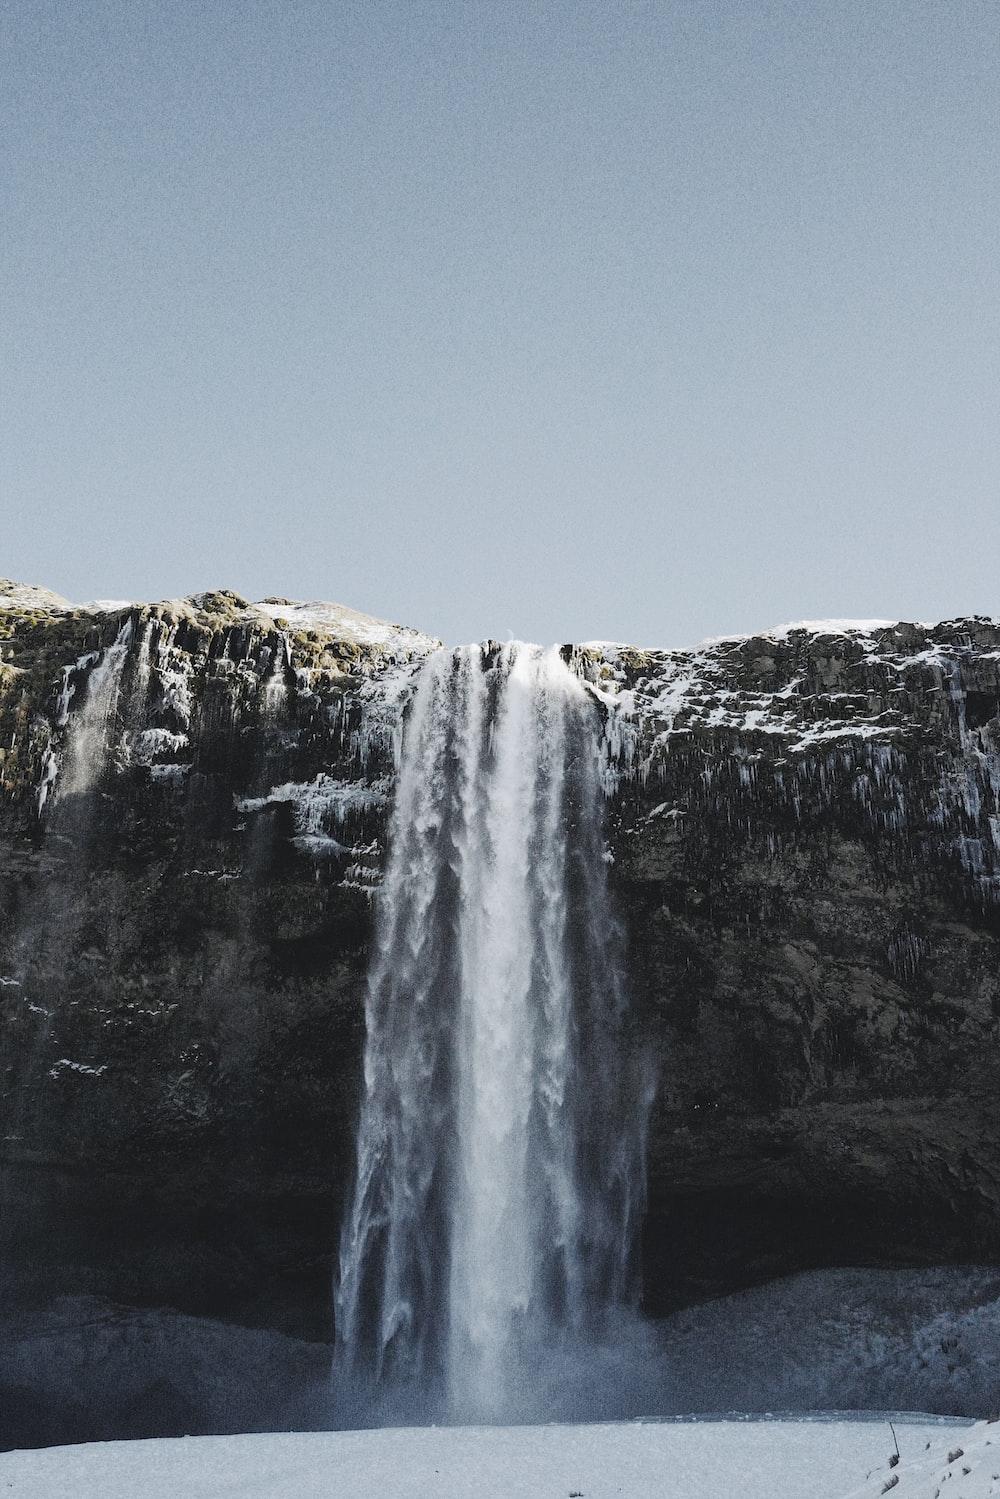 waterfall under blue sky